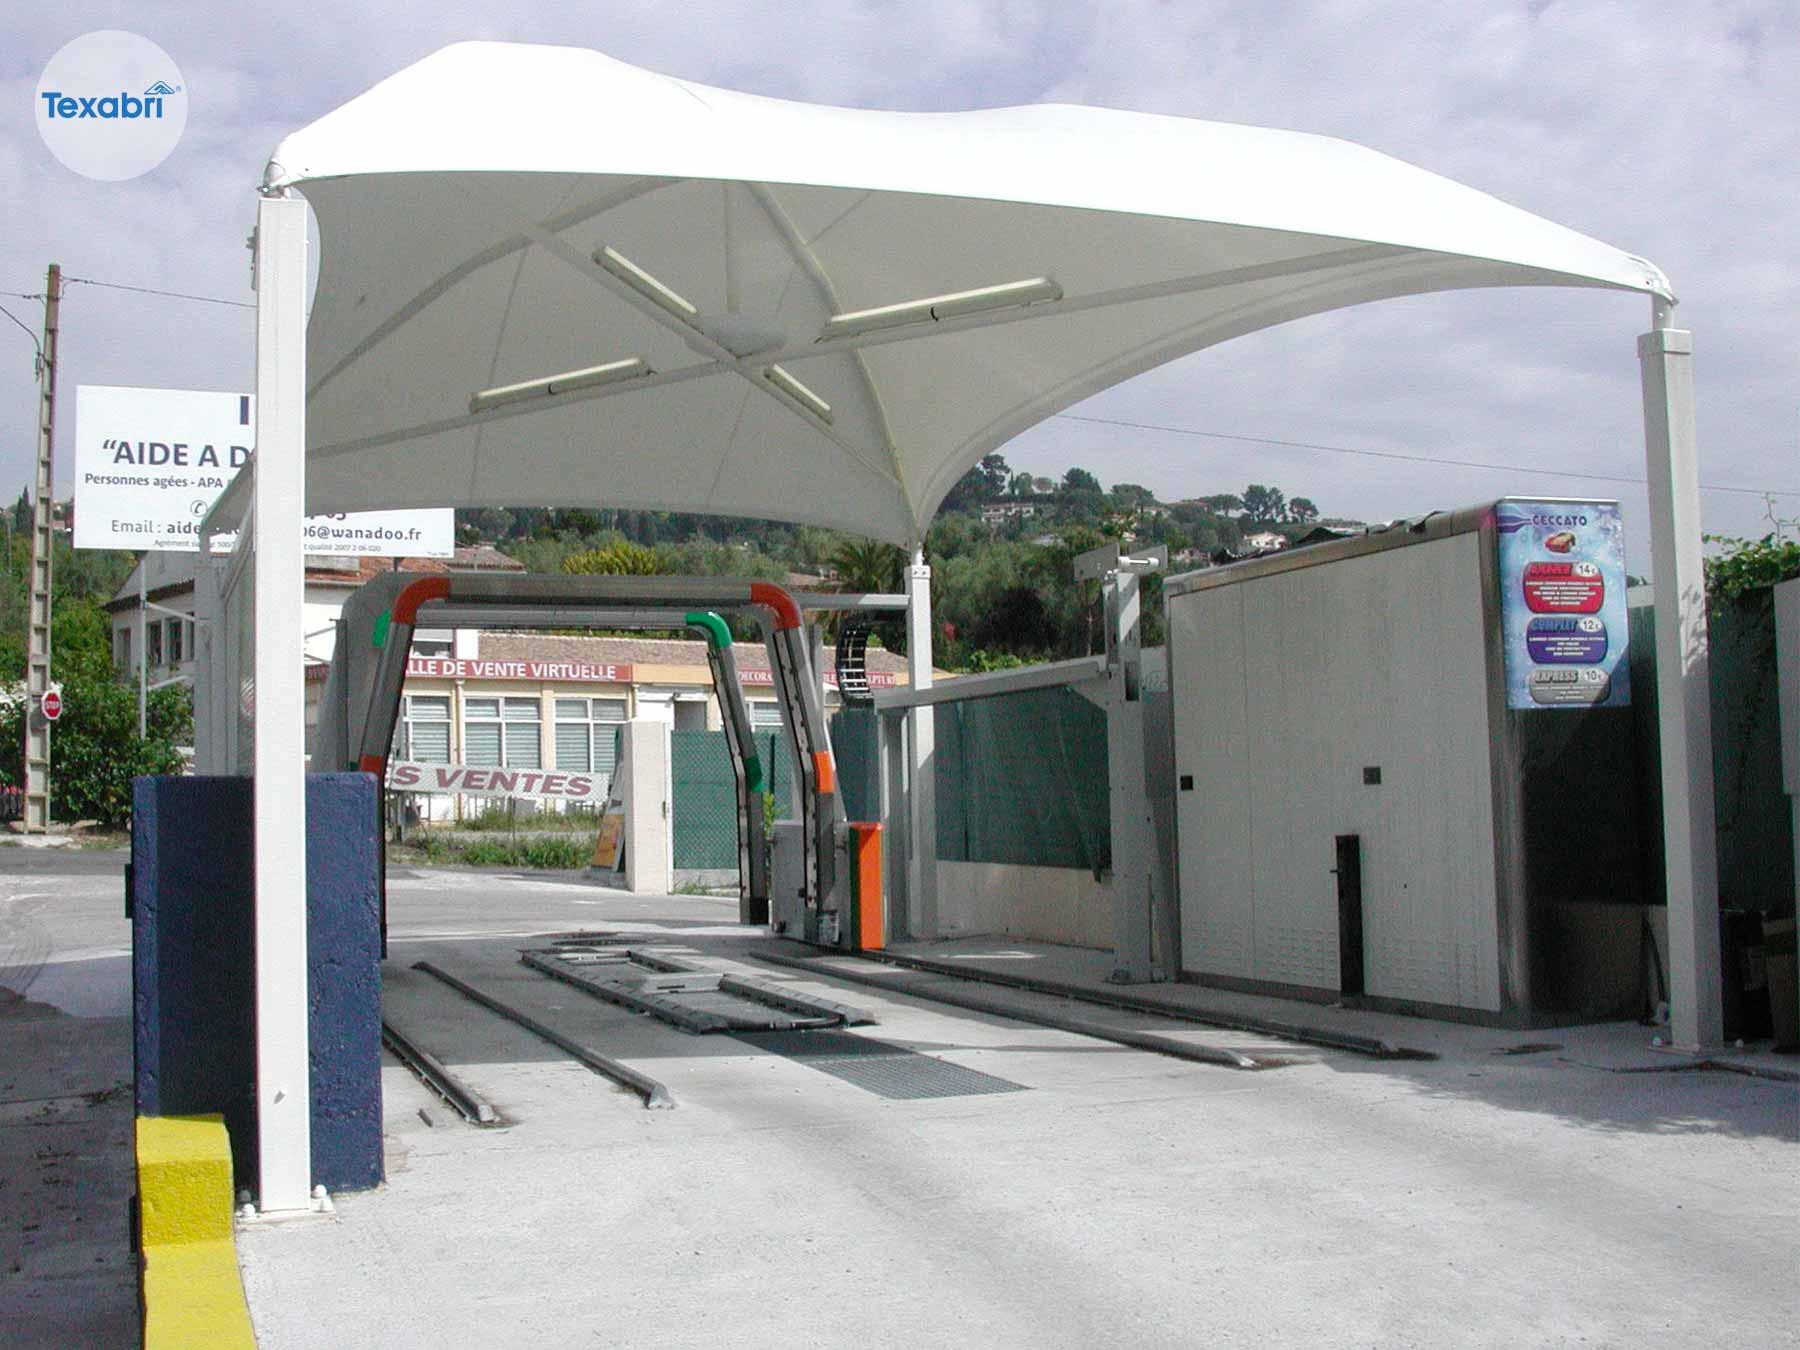 abri-tunnel-lavage-texabri